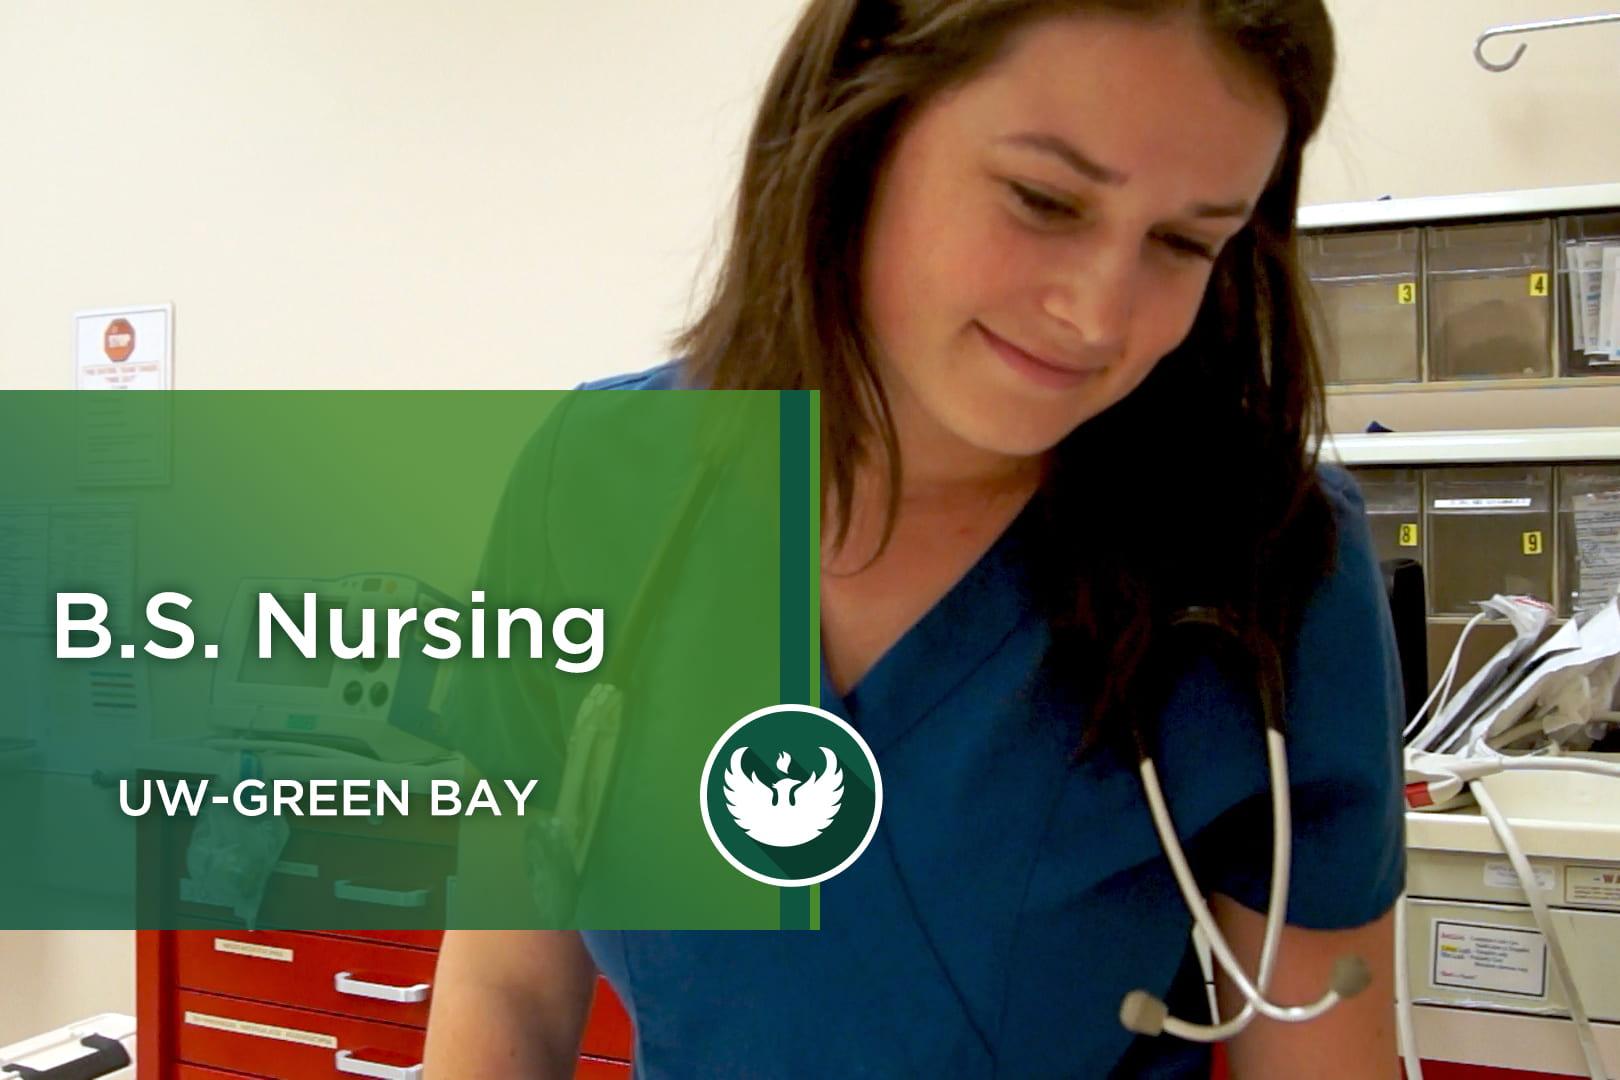 Photo of an UW-Green Bay nursing student at Aurora Hospital during nursing training.